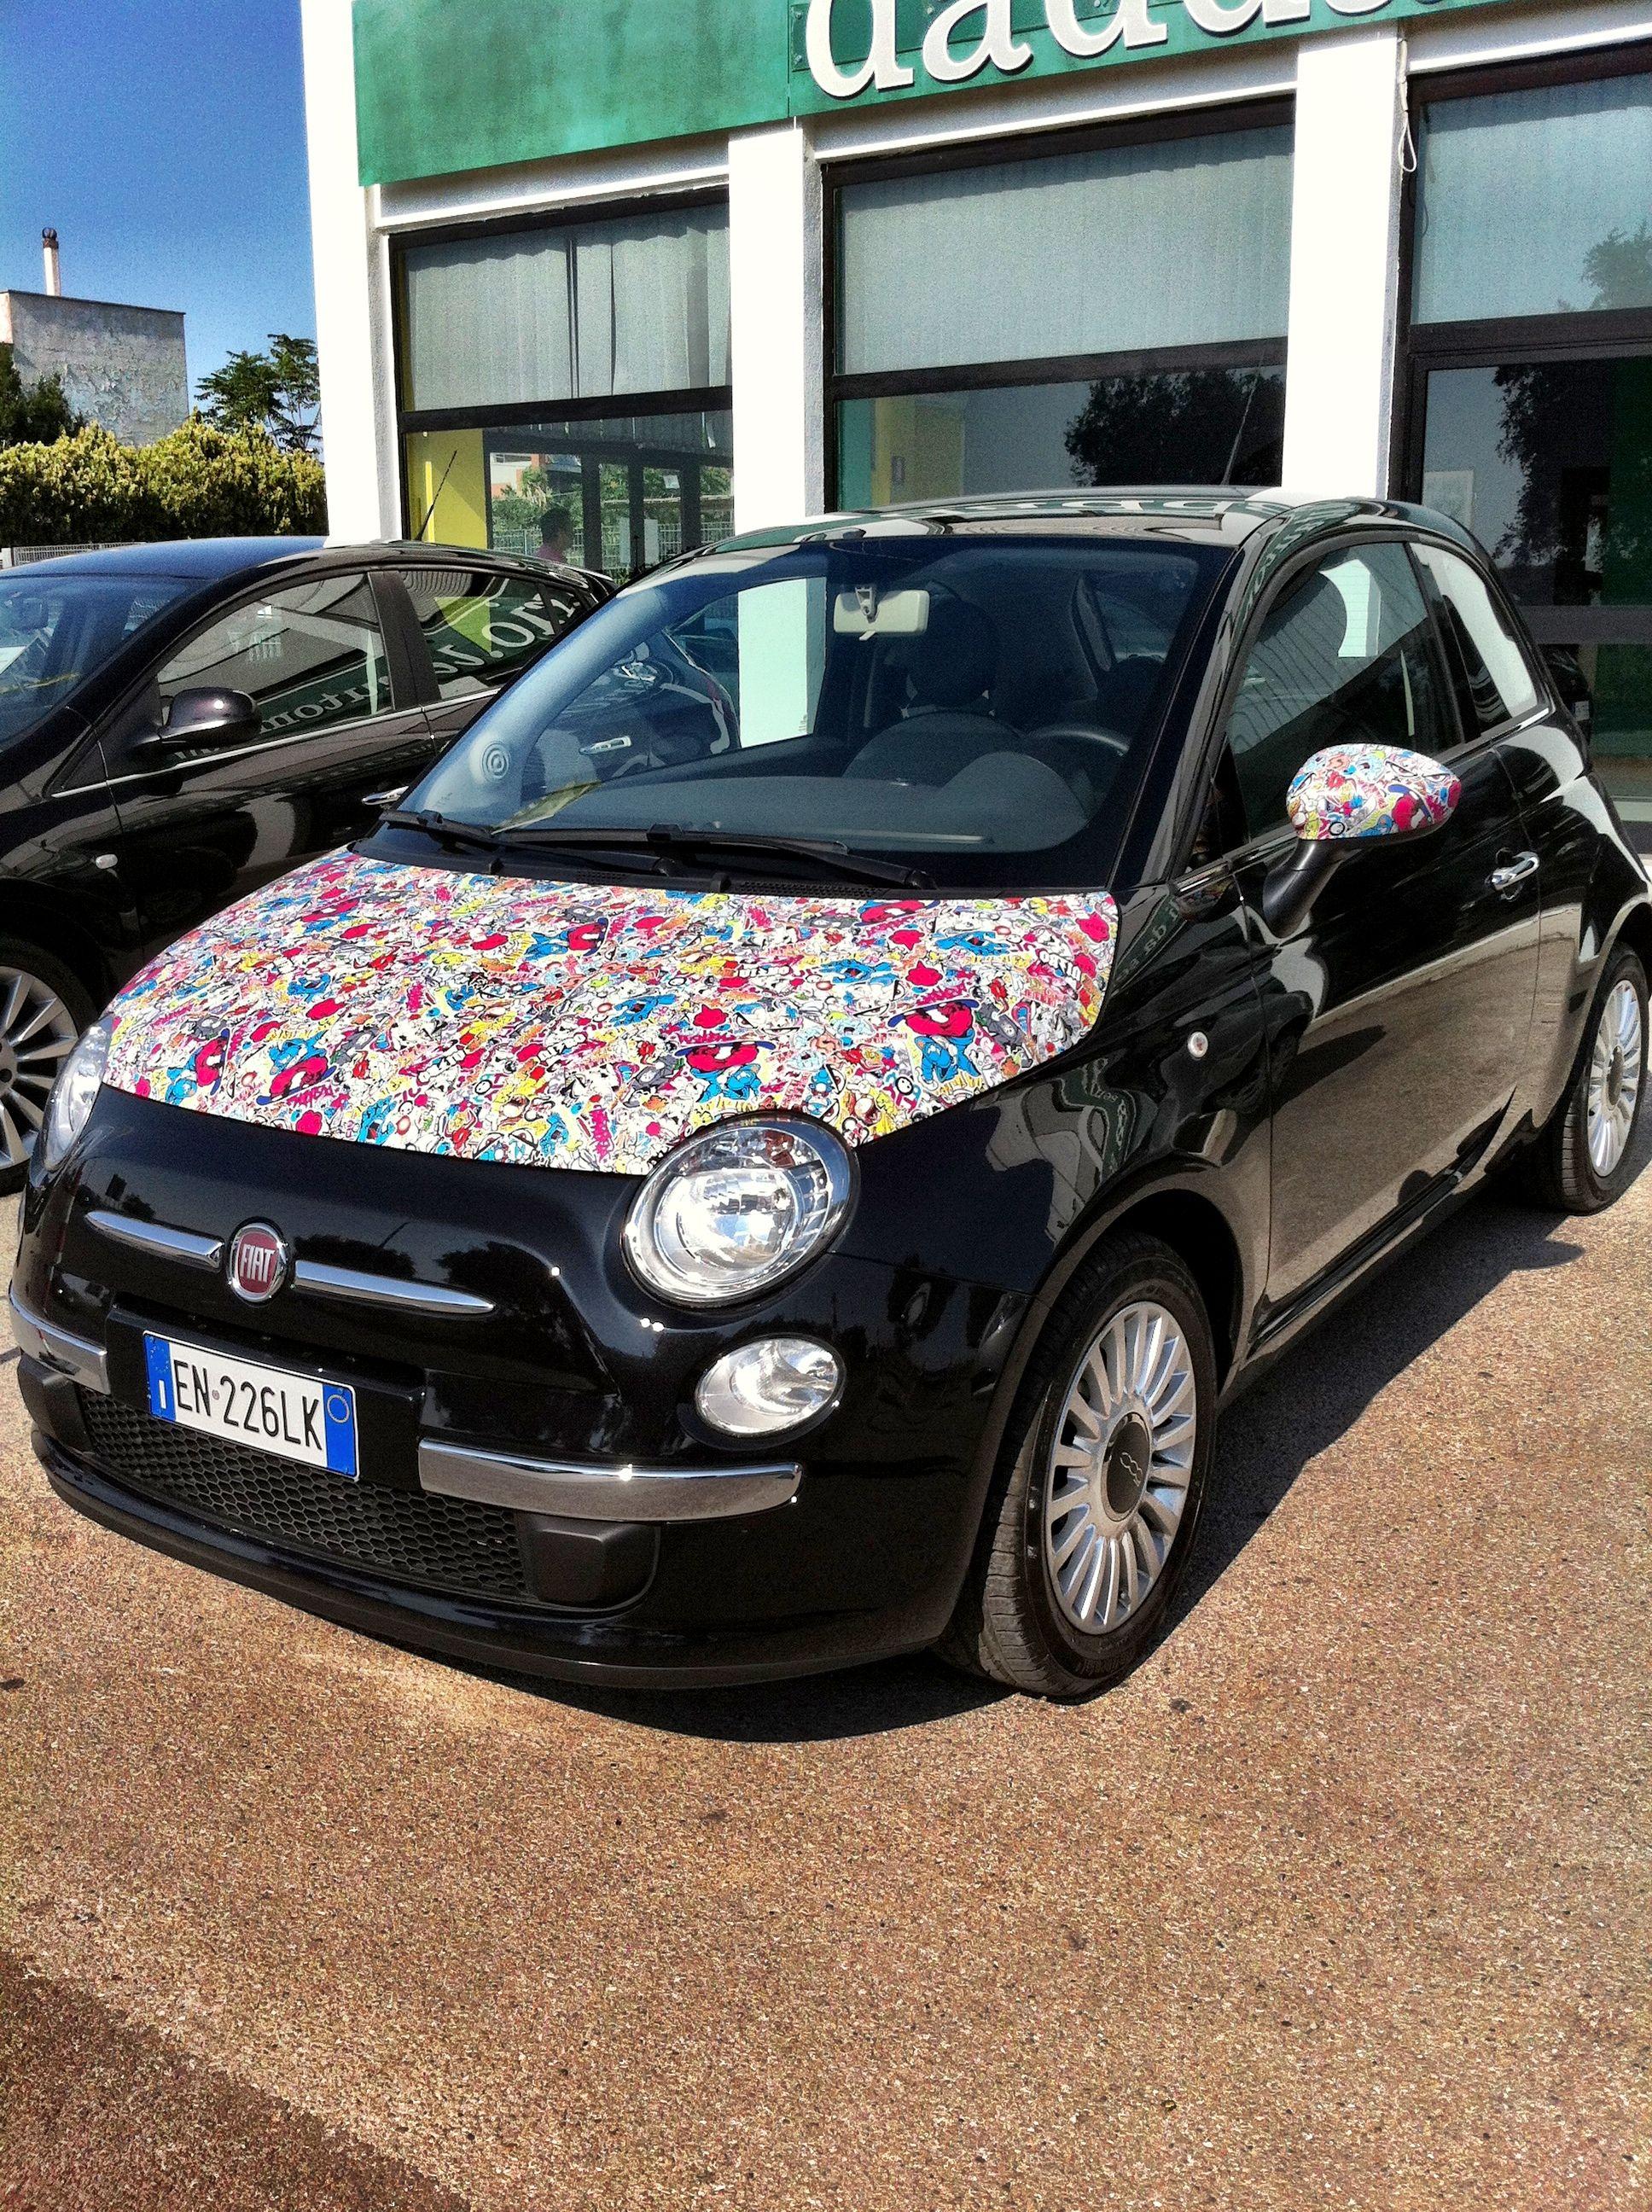 Car Wrap New Fiat 500 Www Daddario It Car Wrap Design Car Wrap Sticker Bomb